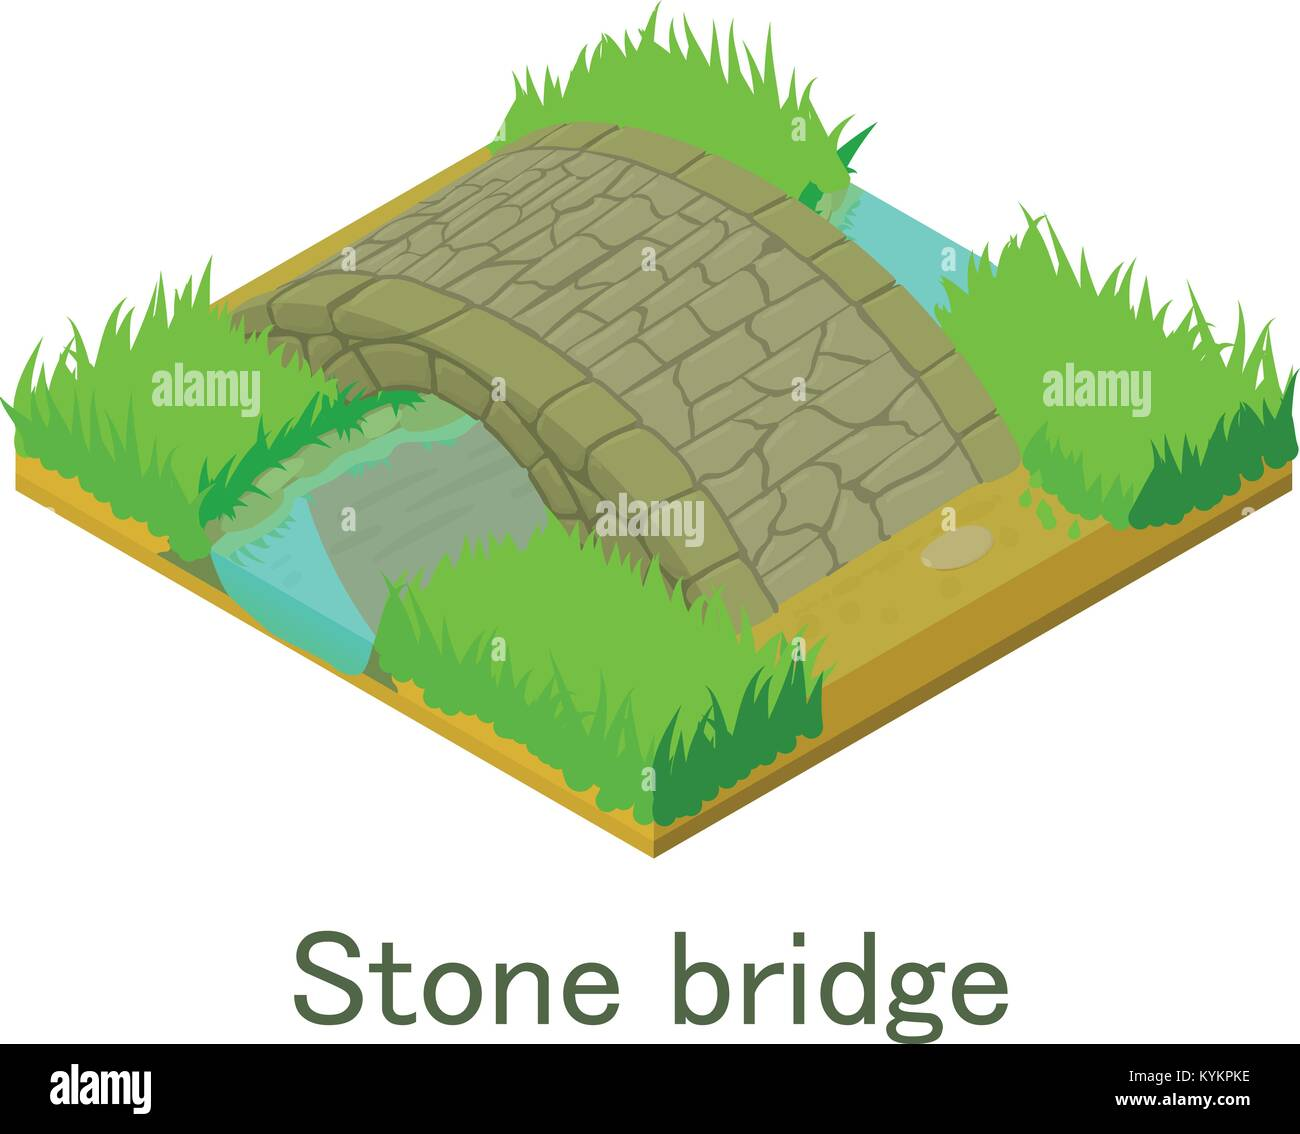 Stone broge icon, isometric style. - Stock Image